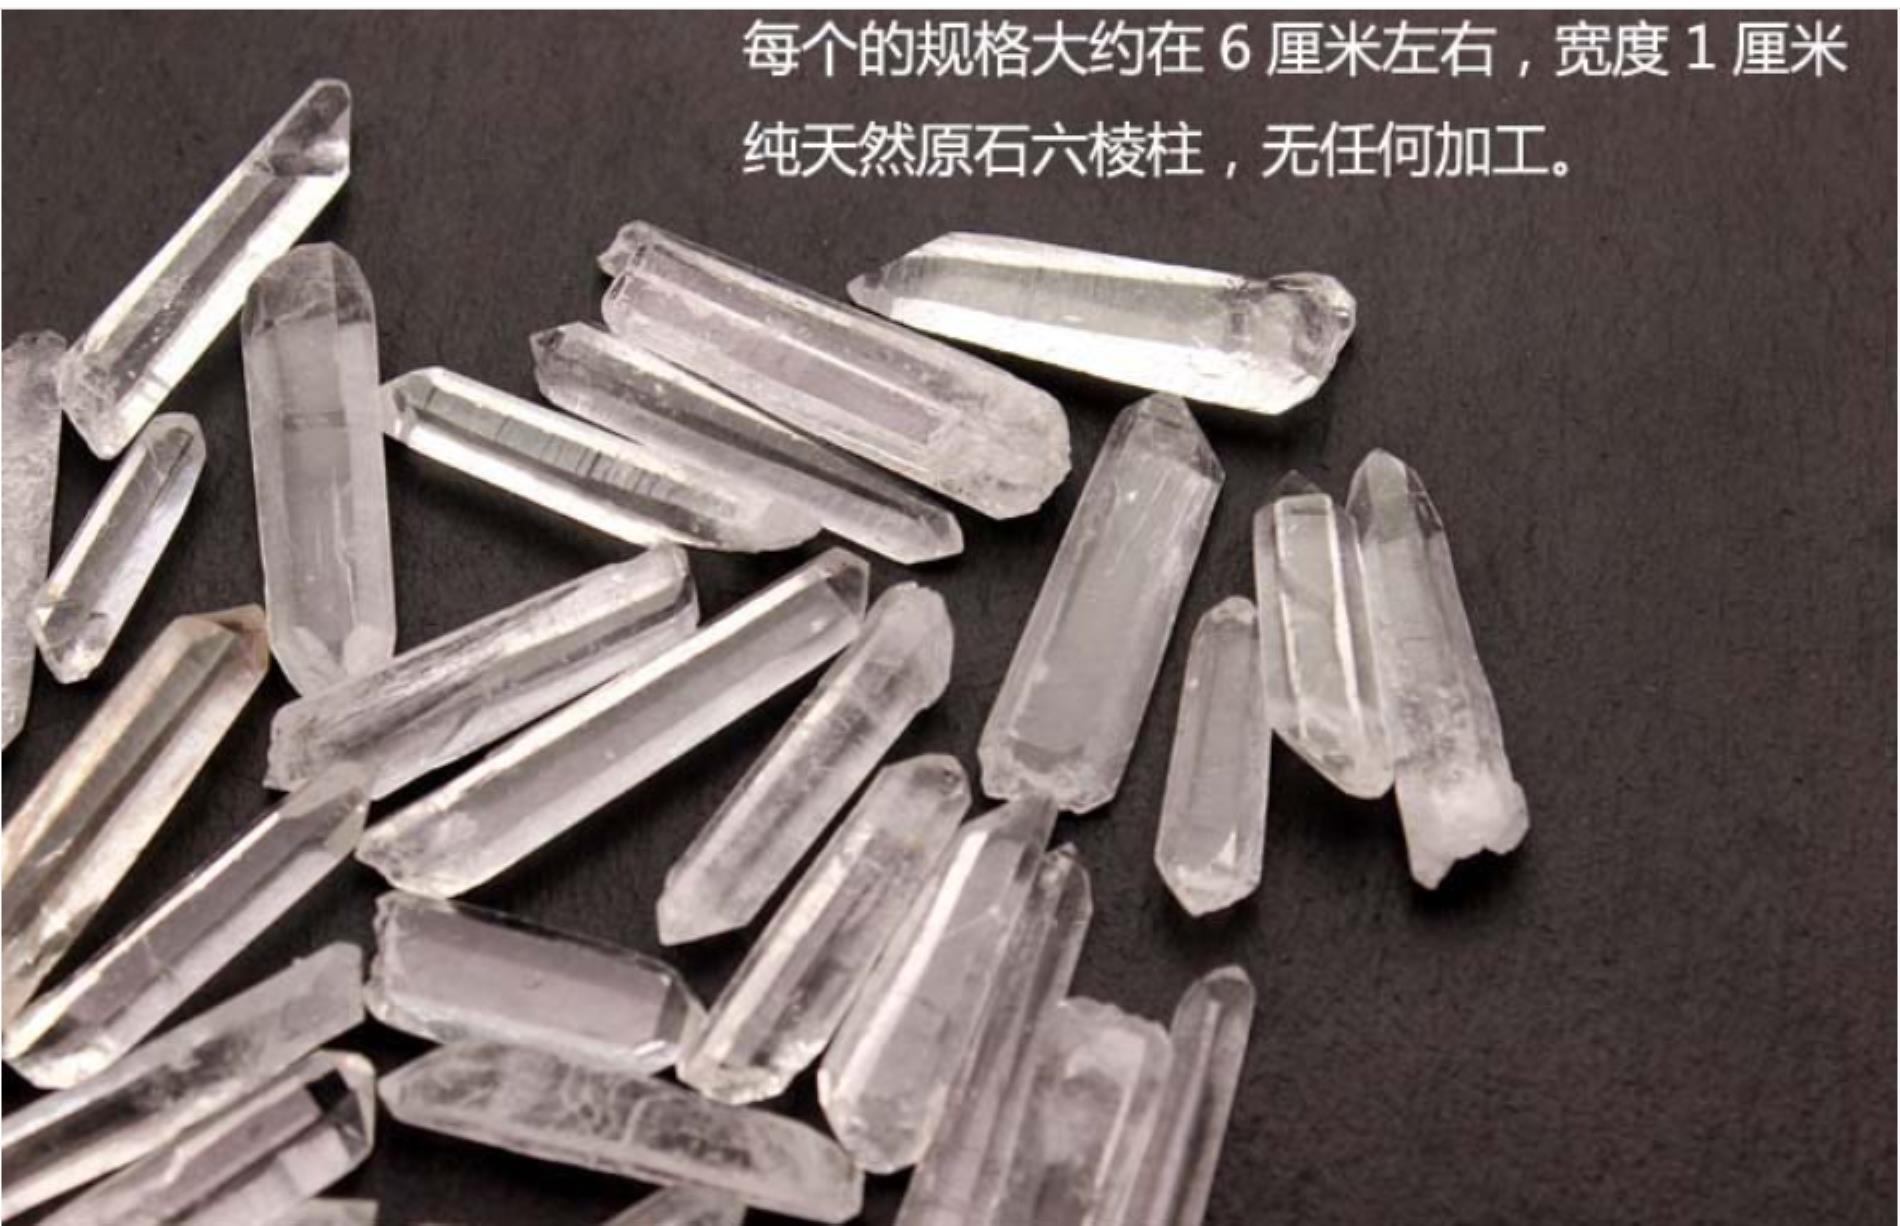 bolsa!! Atacado 200g Bulk Pequenos Points Clear Quartzo Cristal Mineral Mineral Reiki Boa Qylngn HairClippersCompras